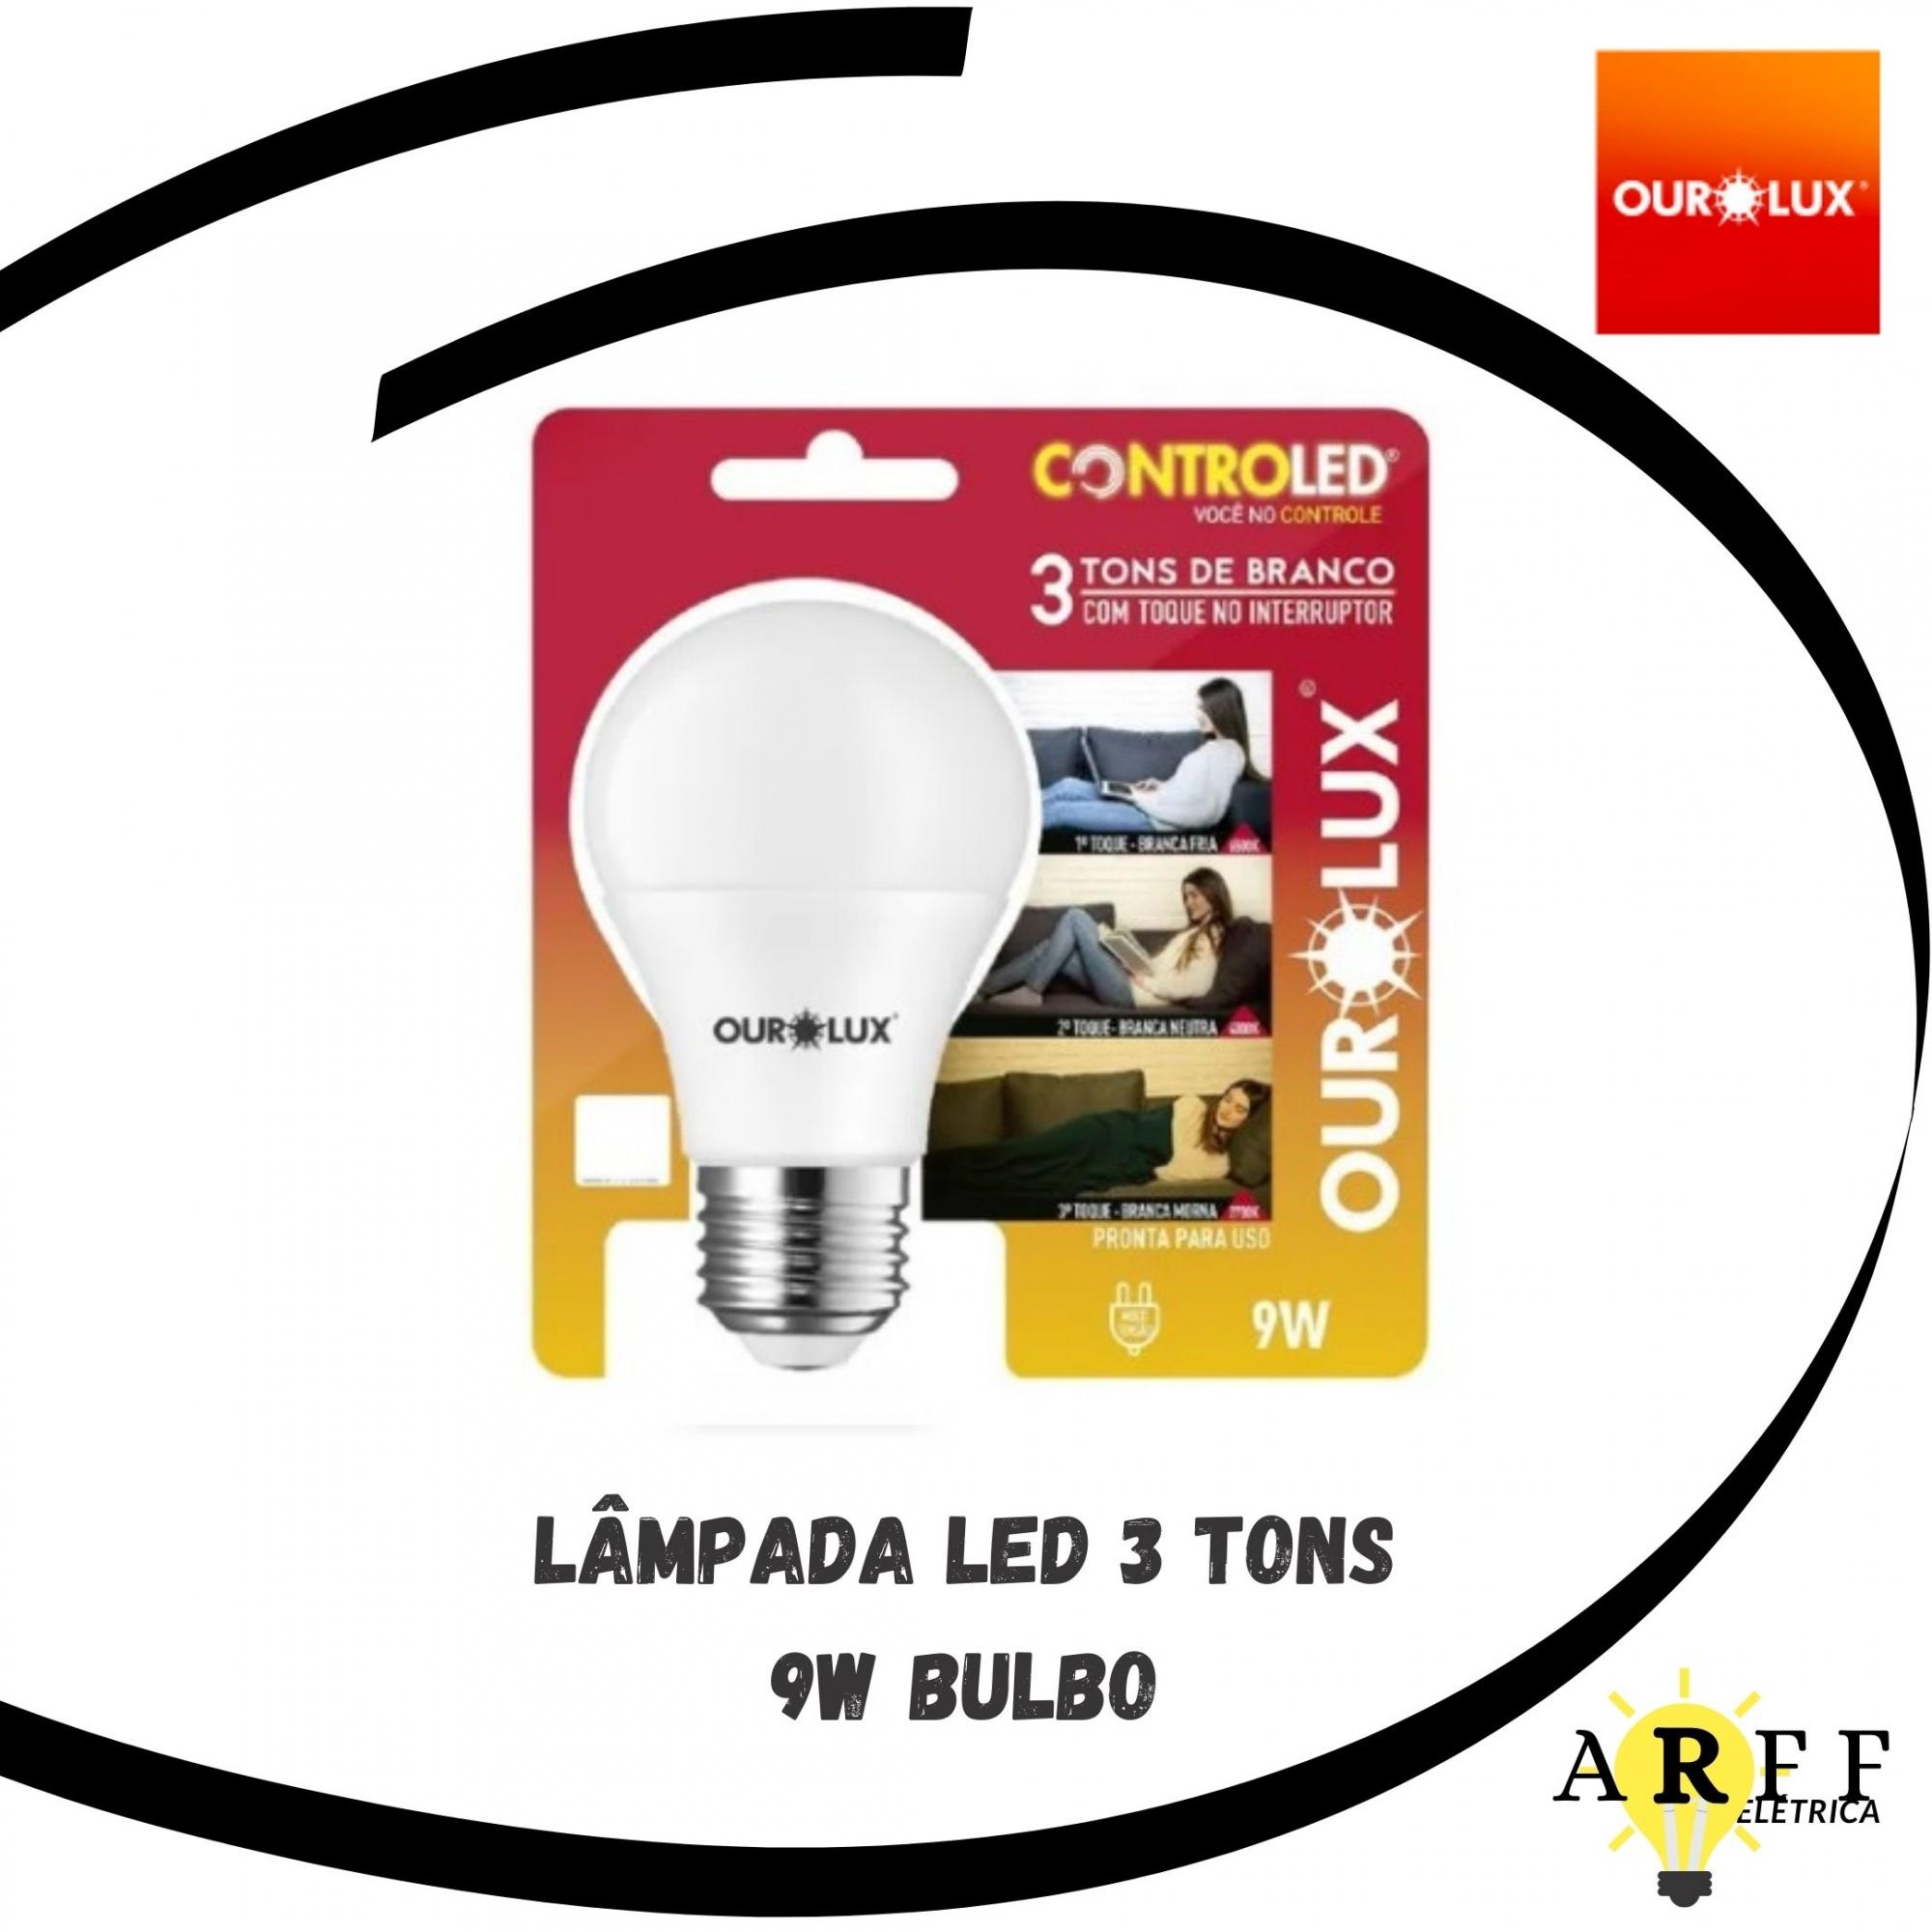 Lâmpada LED 3 Tons Branco 9W OUROLUX